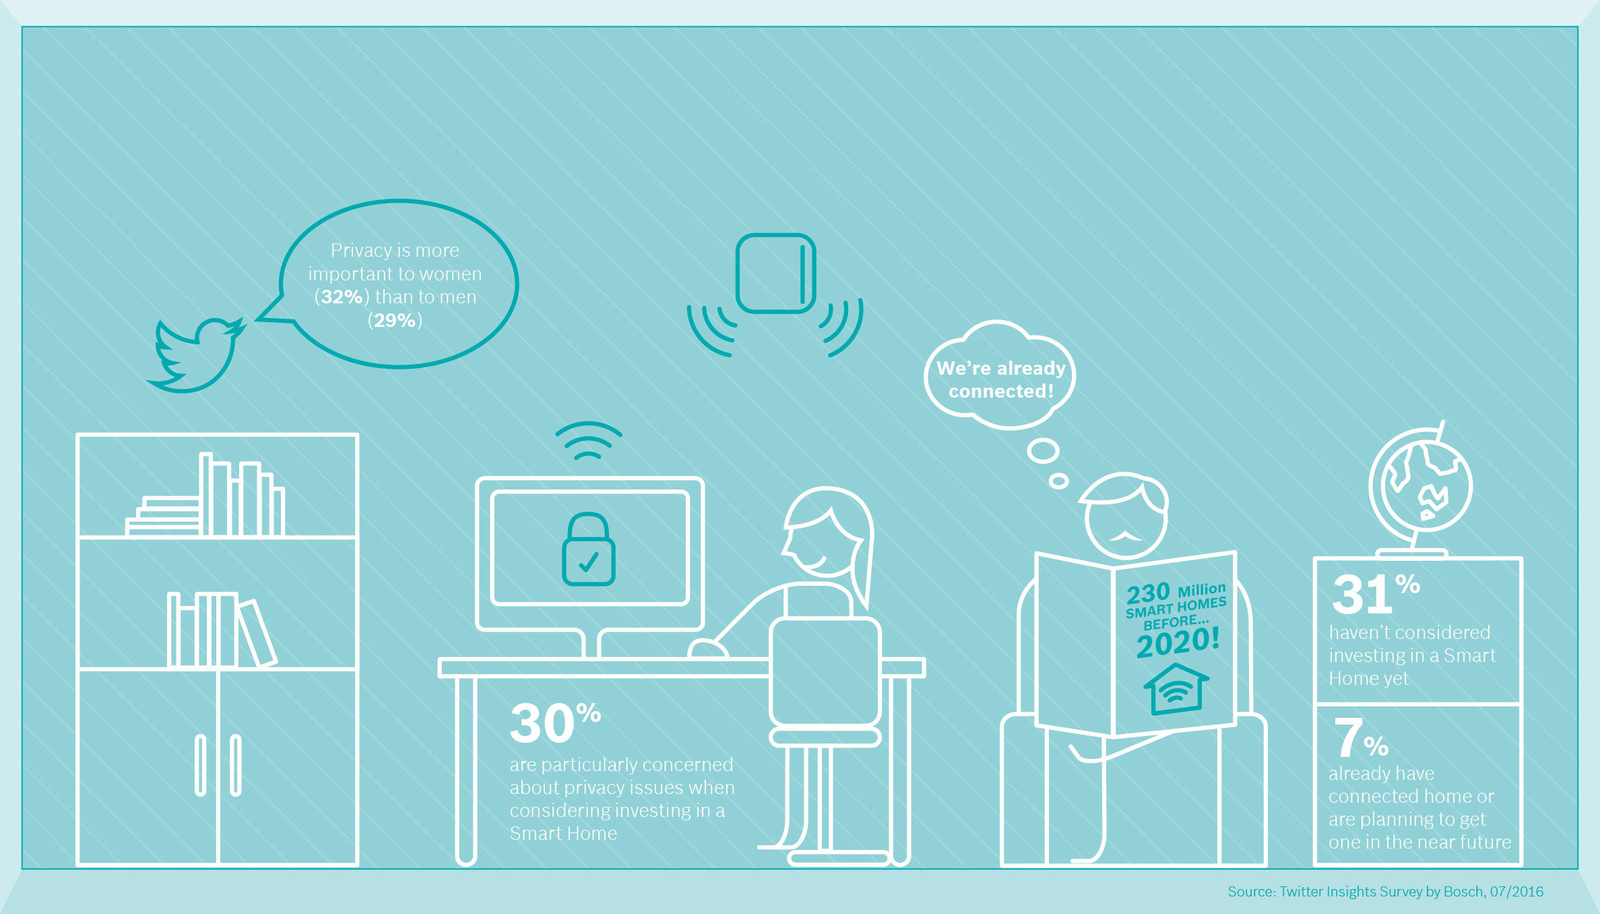 Results Bosch Smart Home Survey